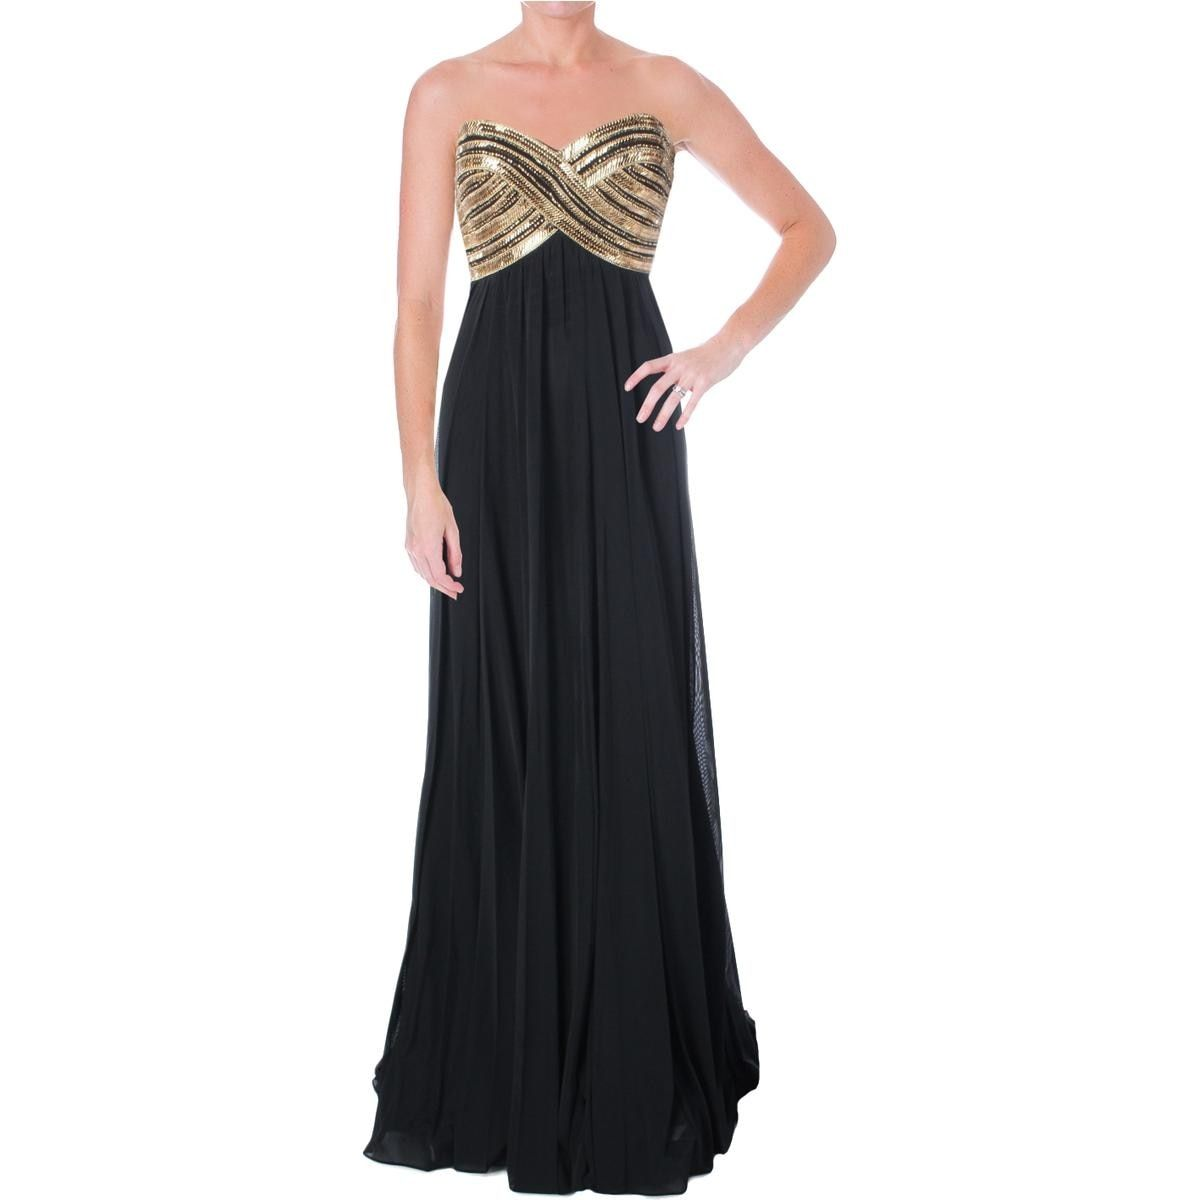 JVN by Jovani Womens Beaded Prom Formal Dress